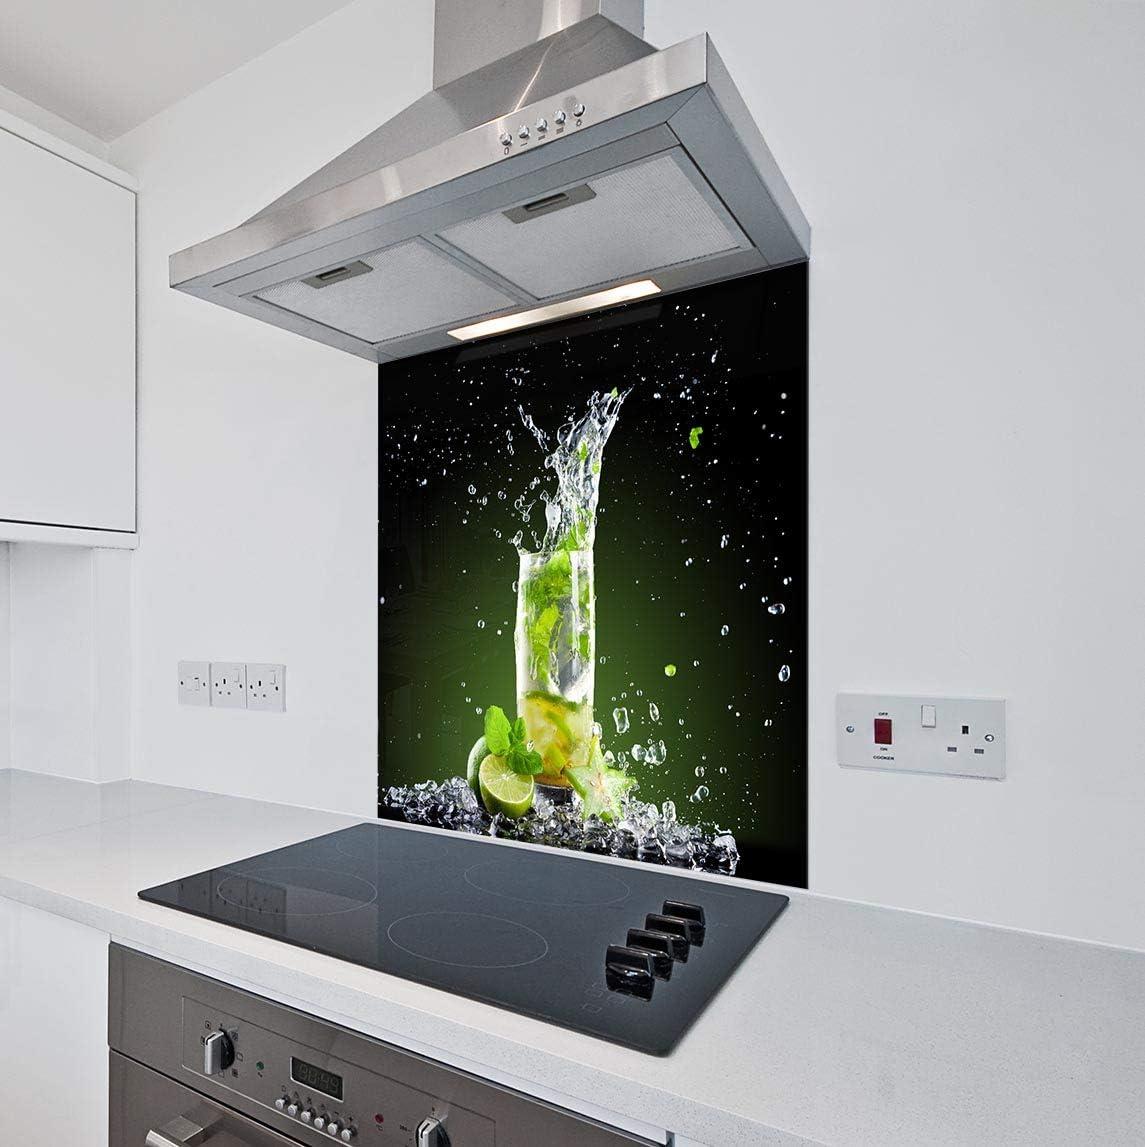 Printed Kitchen Glass Splashback Heat Resistant Toughened Glass Lime /& Ice Design 40 x 60cm - Mirror Screw Fixing